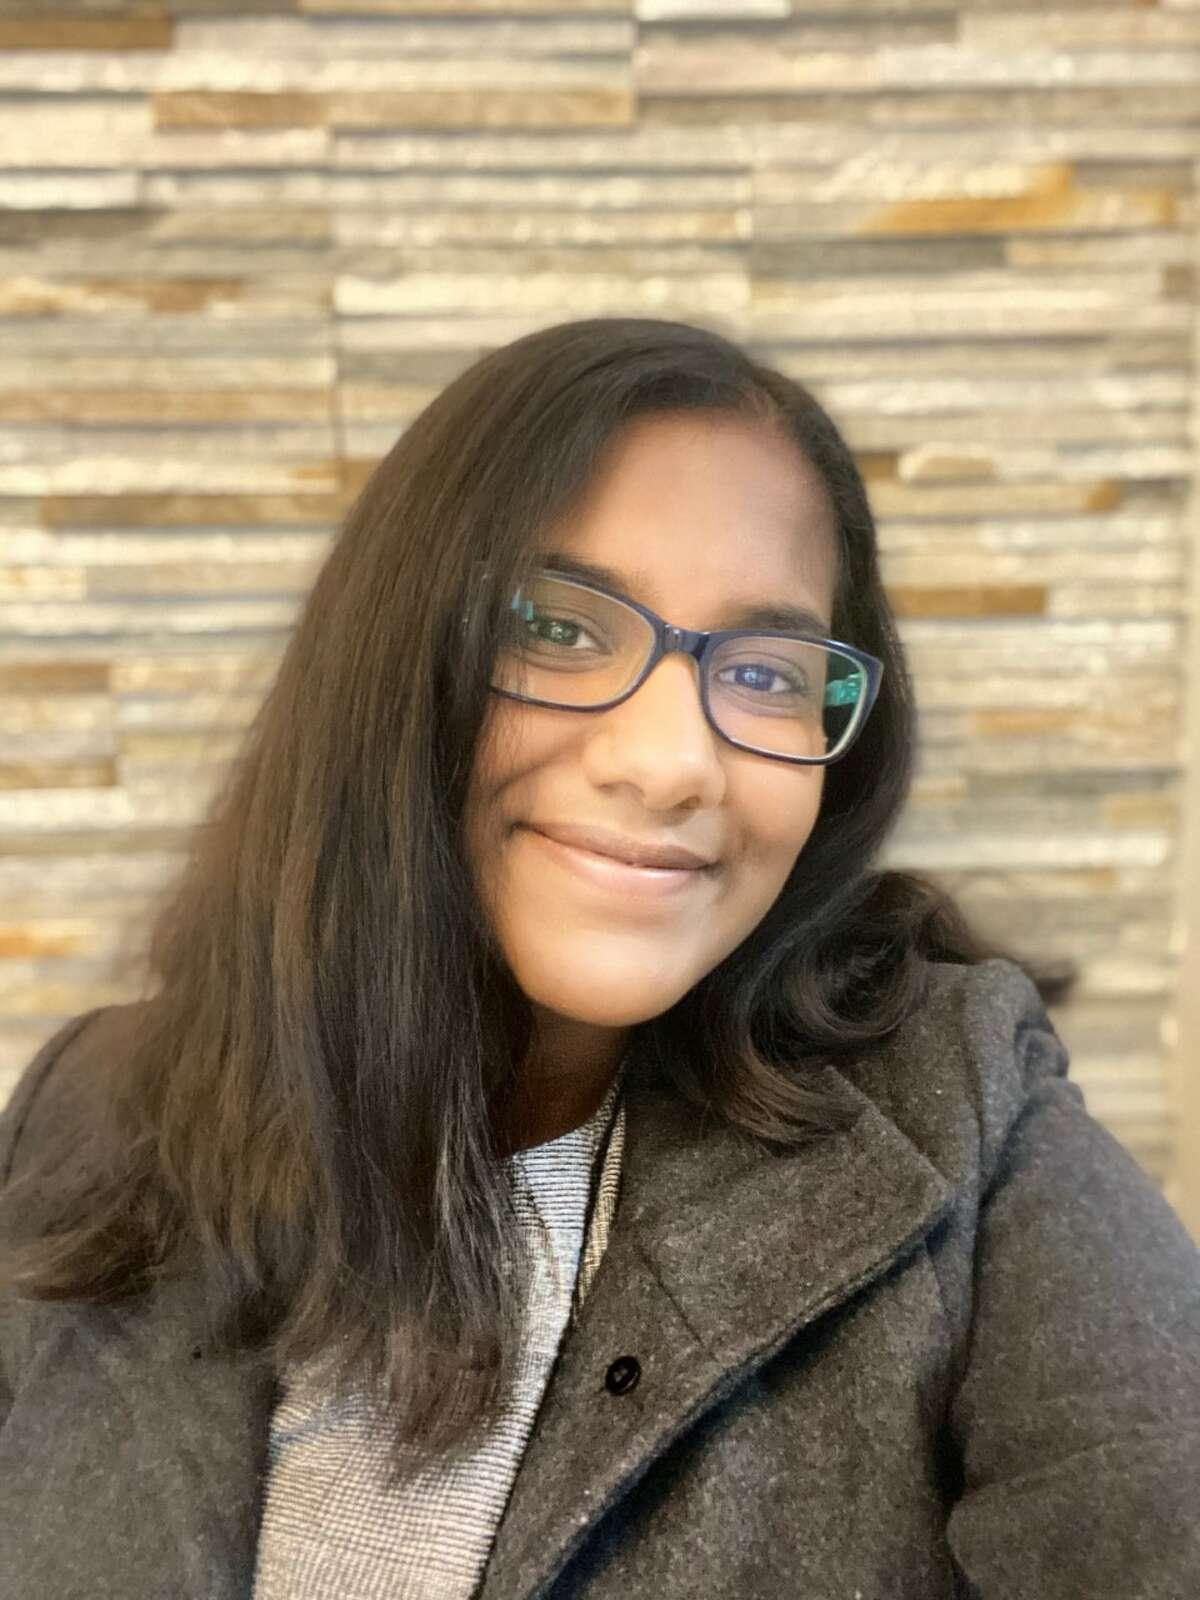 Rajani Nimma is a regional coordinator for Teens Helping Seniors NY.